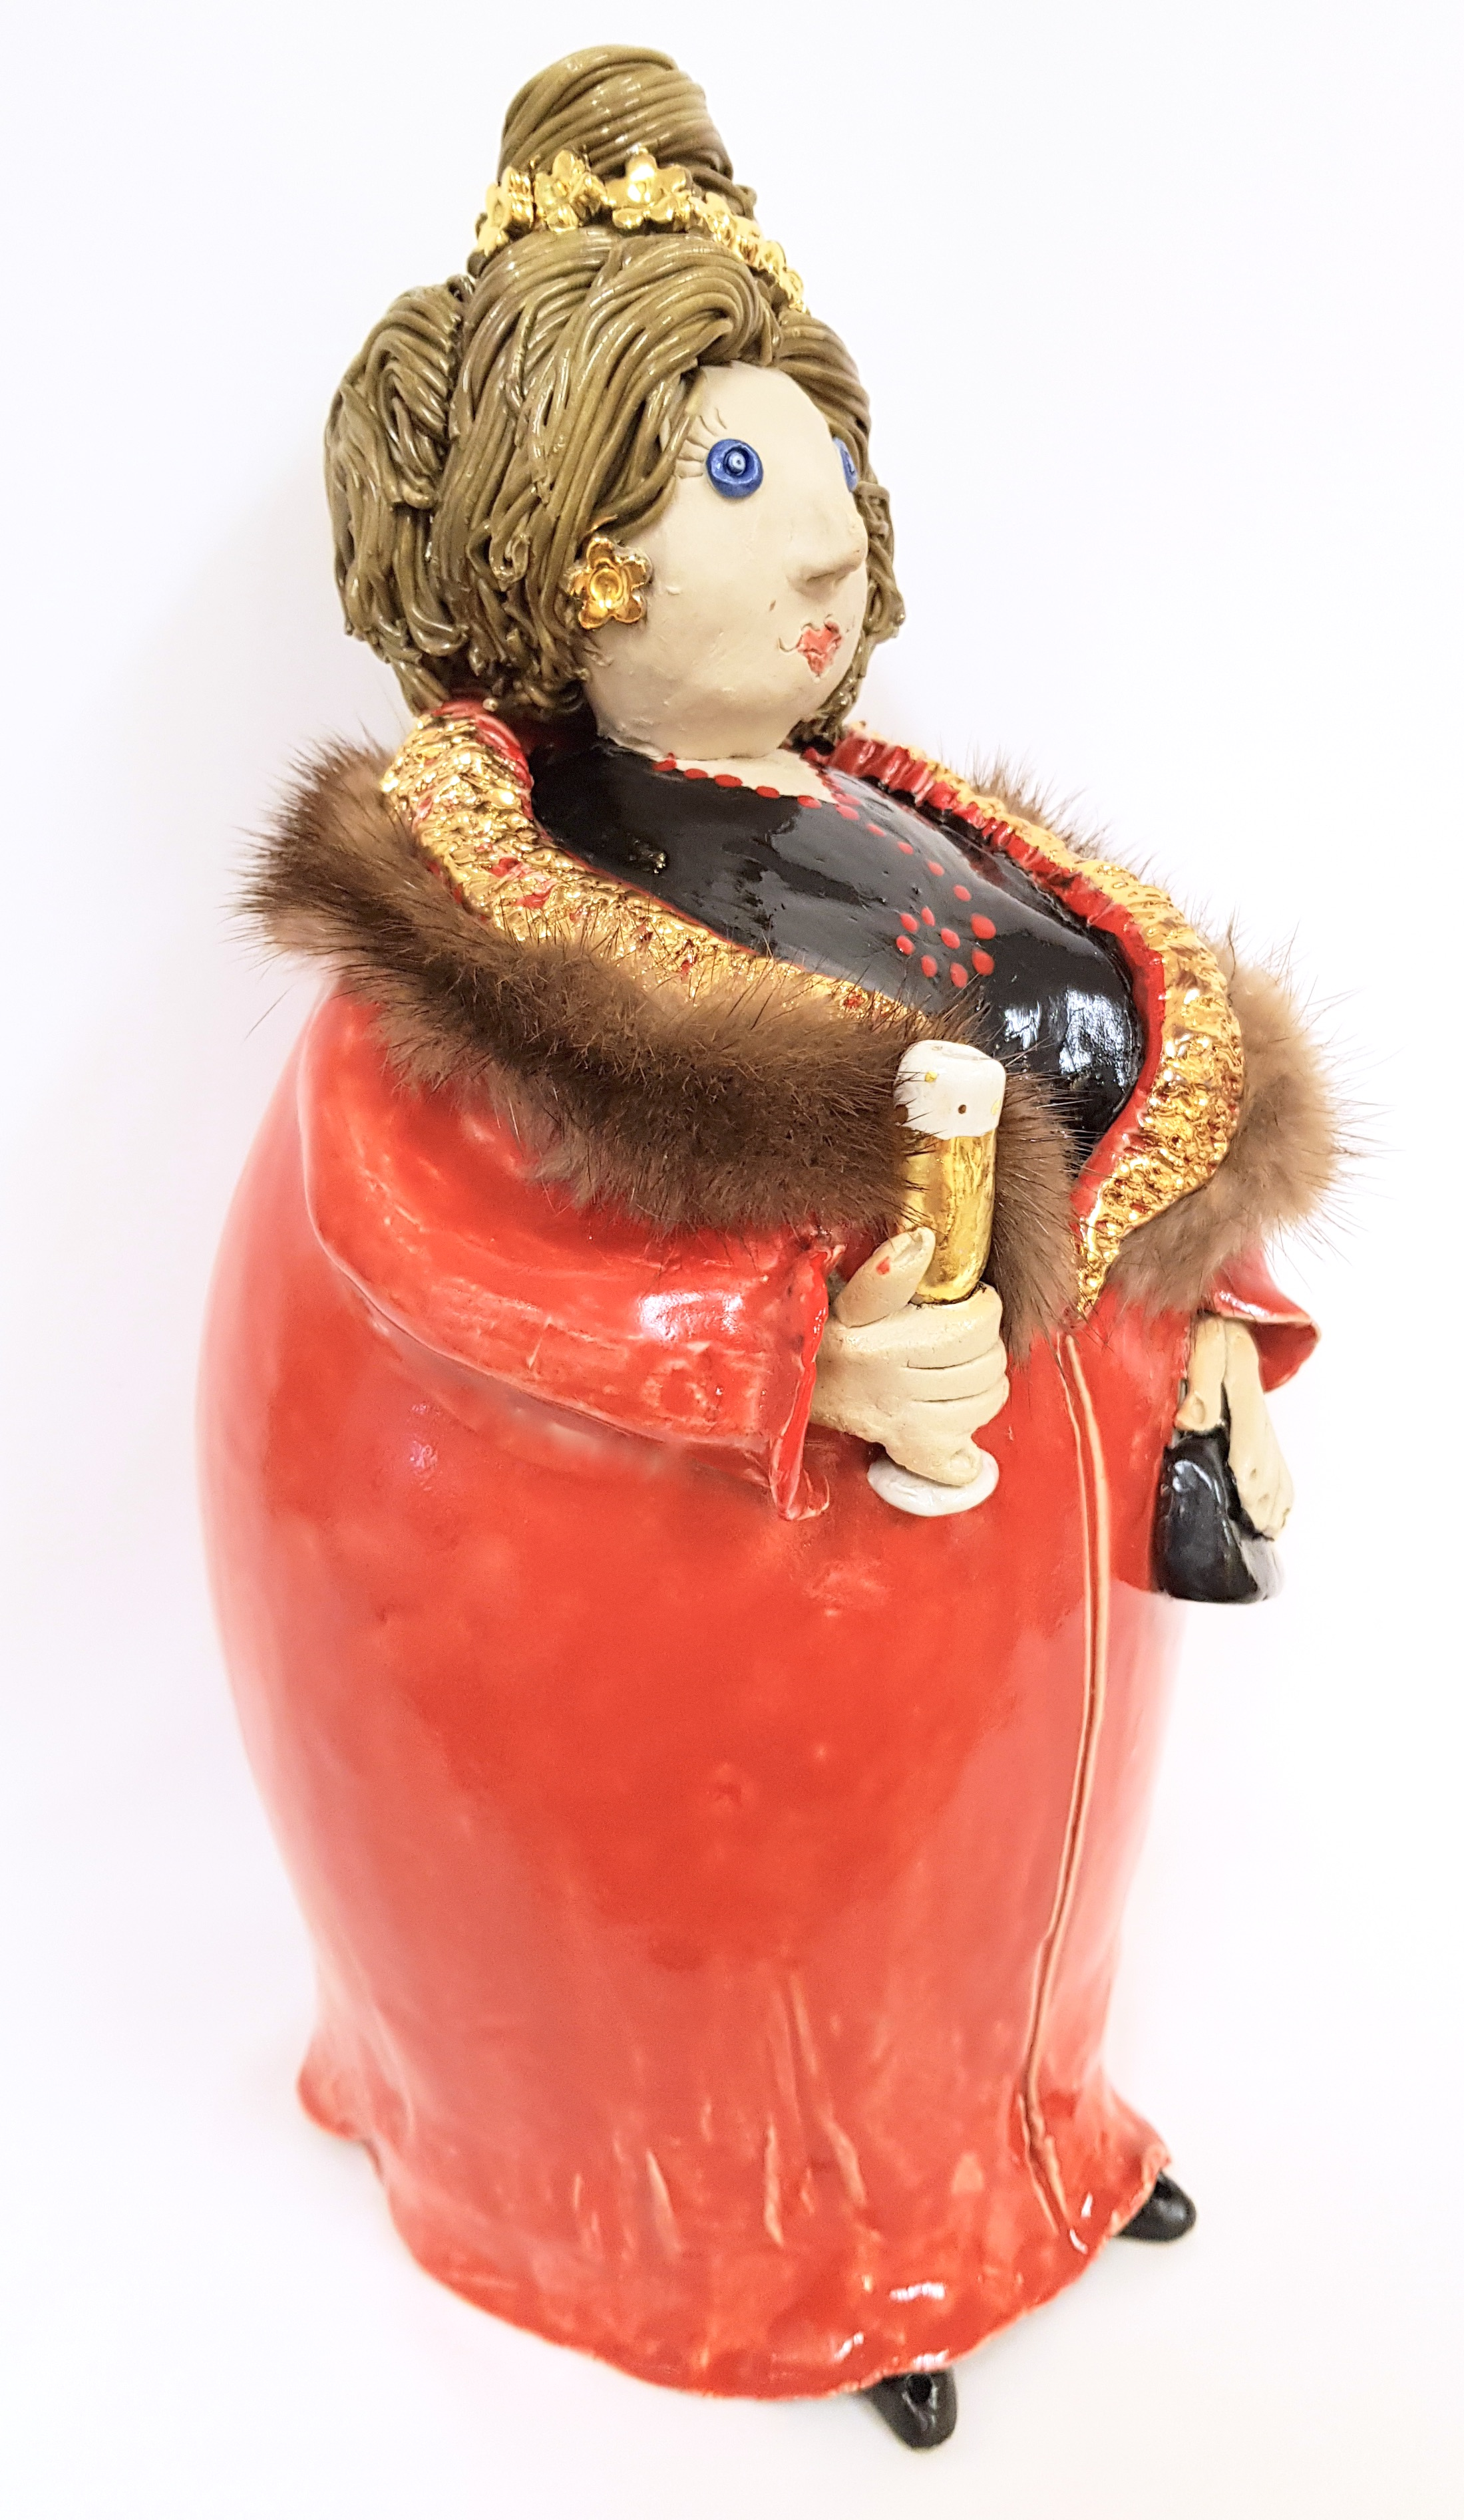 Diva in red, Töpferei la Ceramica Basel, Unikat, Keramik, Frauenpower, Töpferkurse, Teamevent